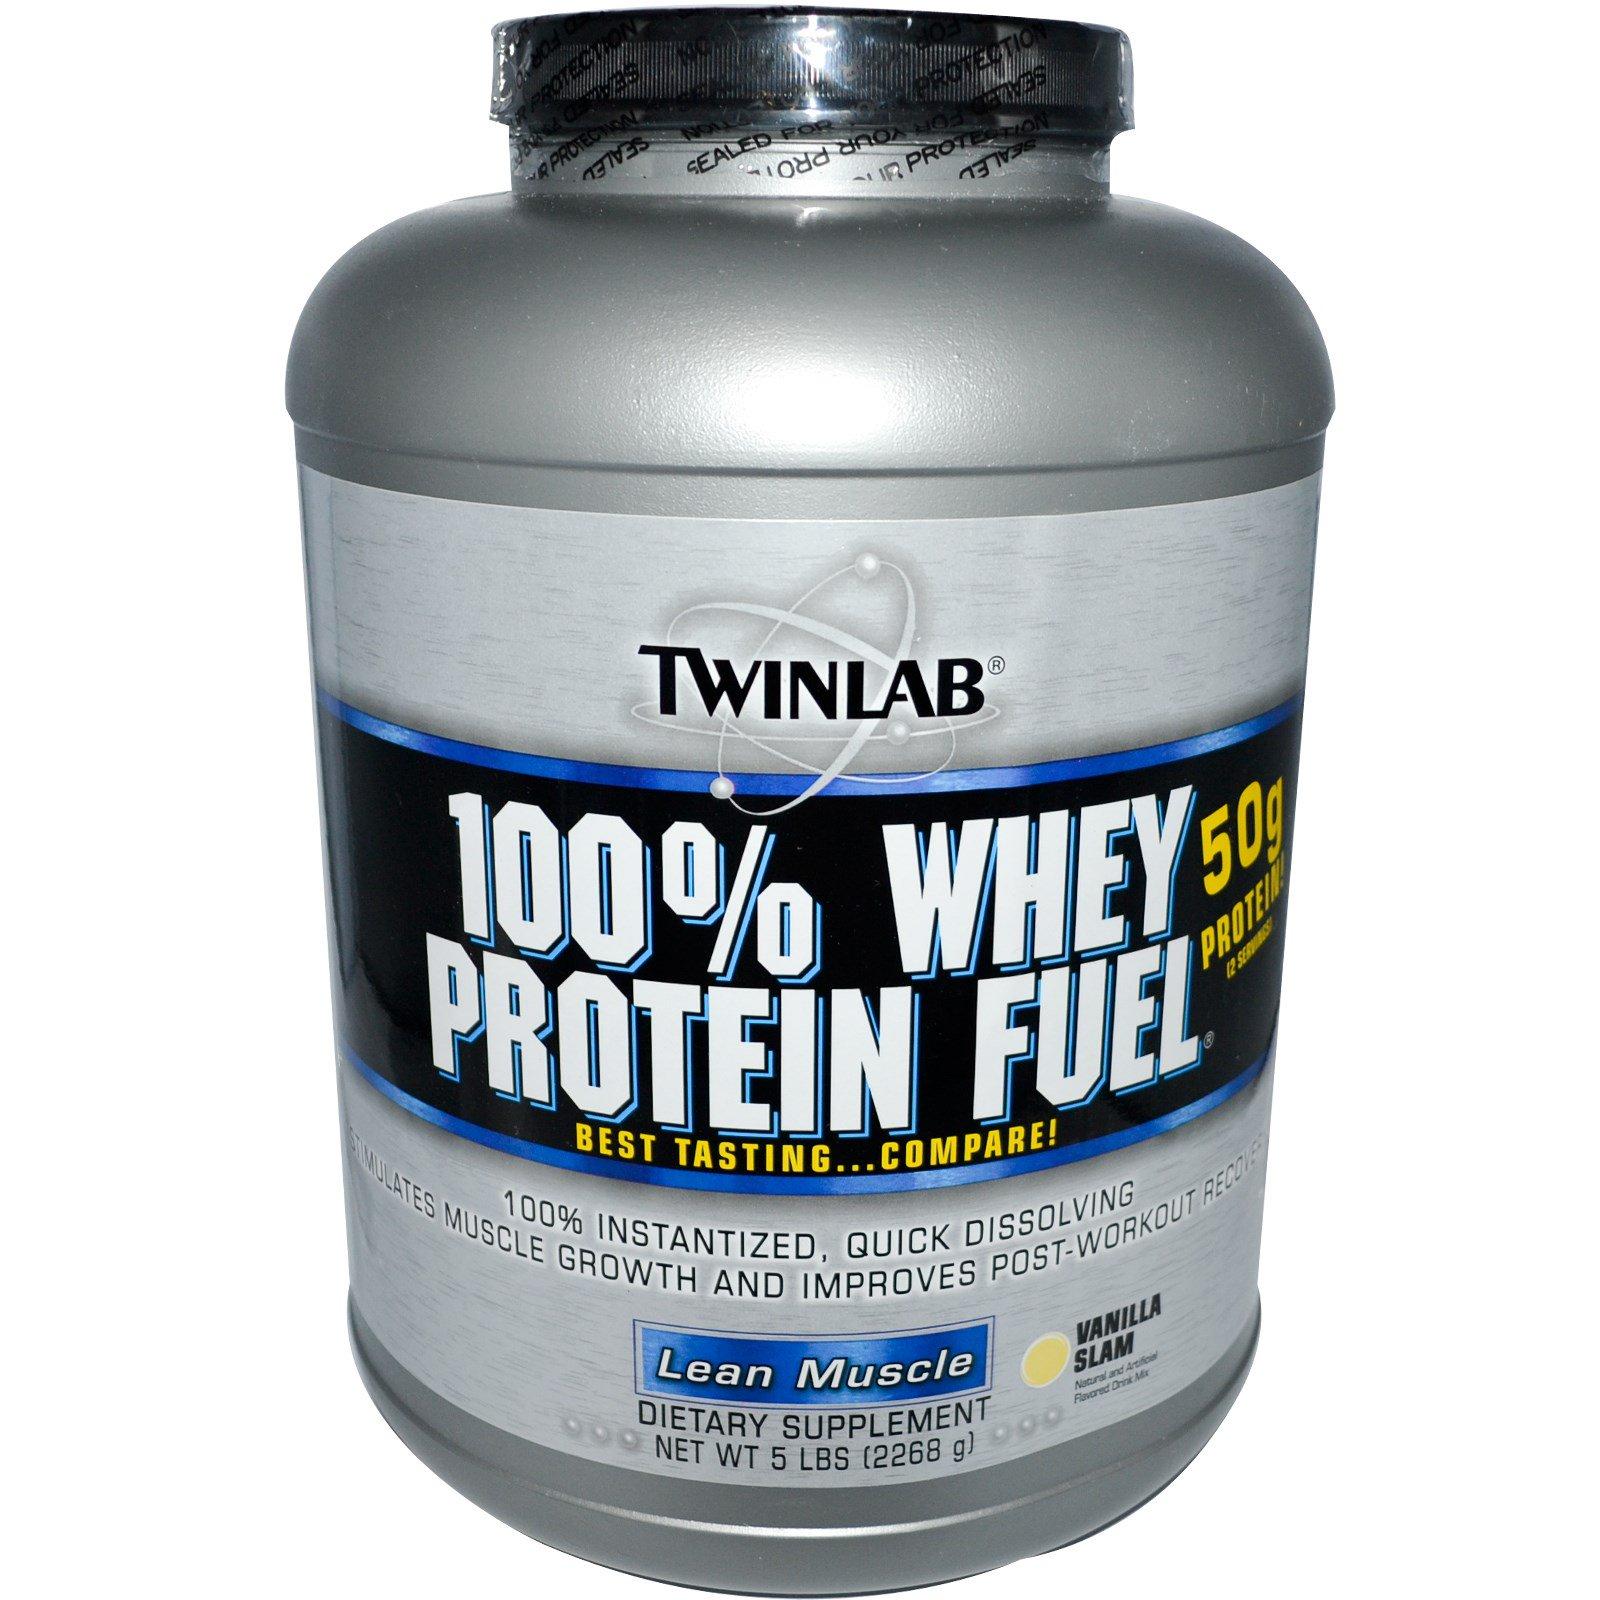 Twinlab 100 Whey Protein Fuel Lean Muscle Vanilla Slam 5 Lbs